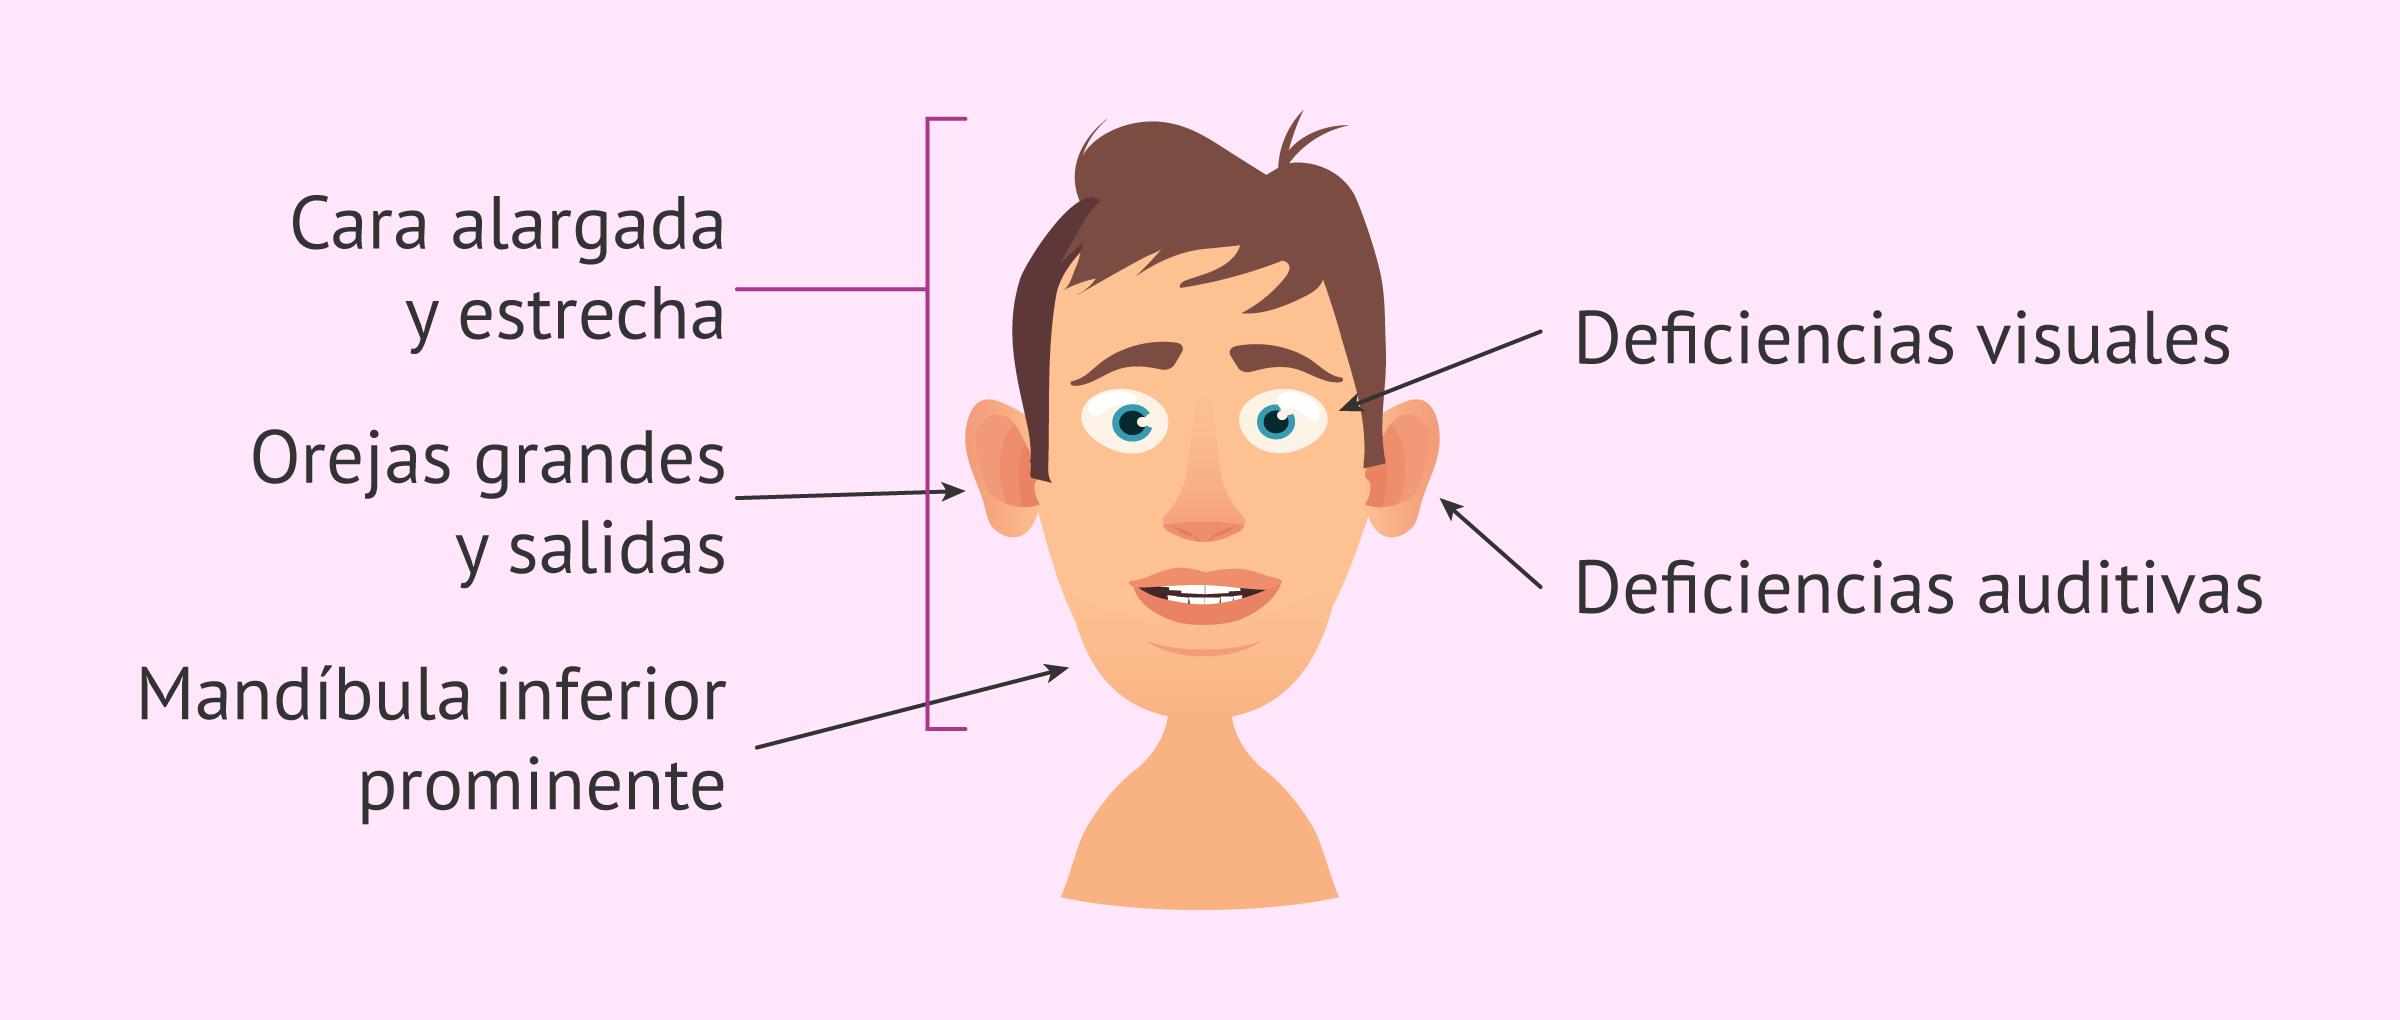 El síndrome X-frágil o de Martin-Bell: características y síntomas